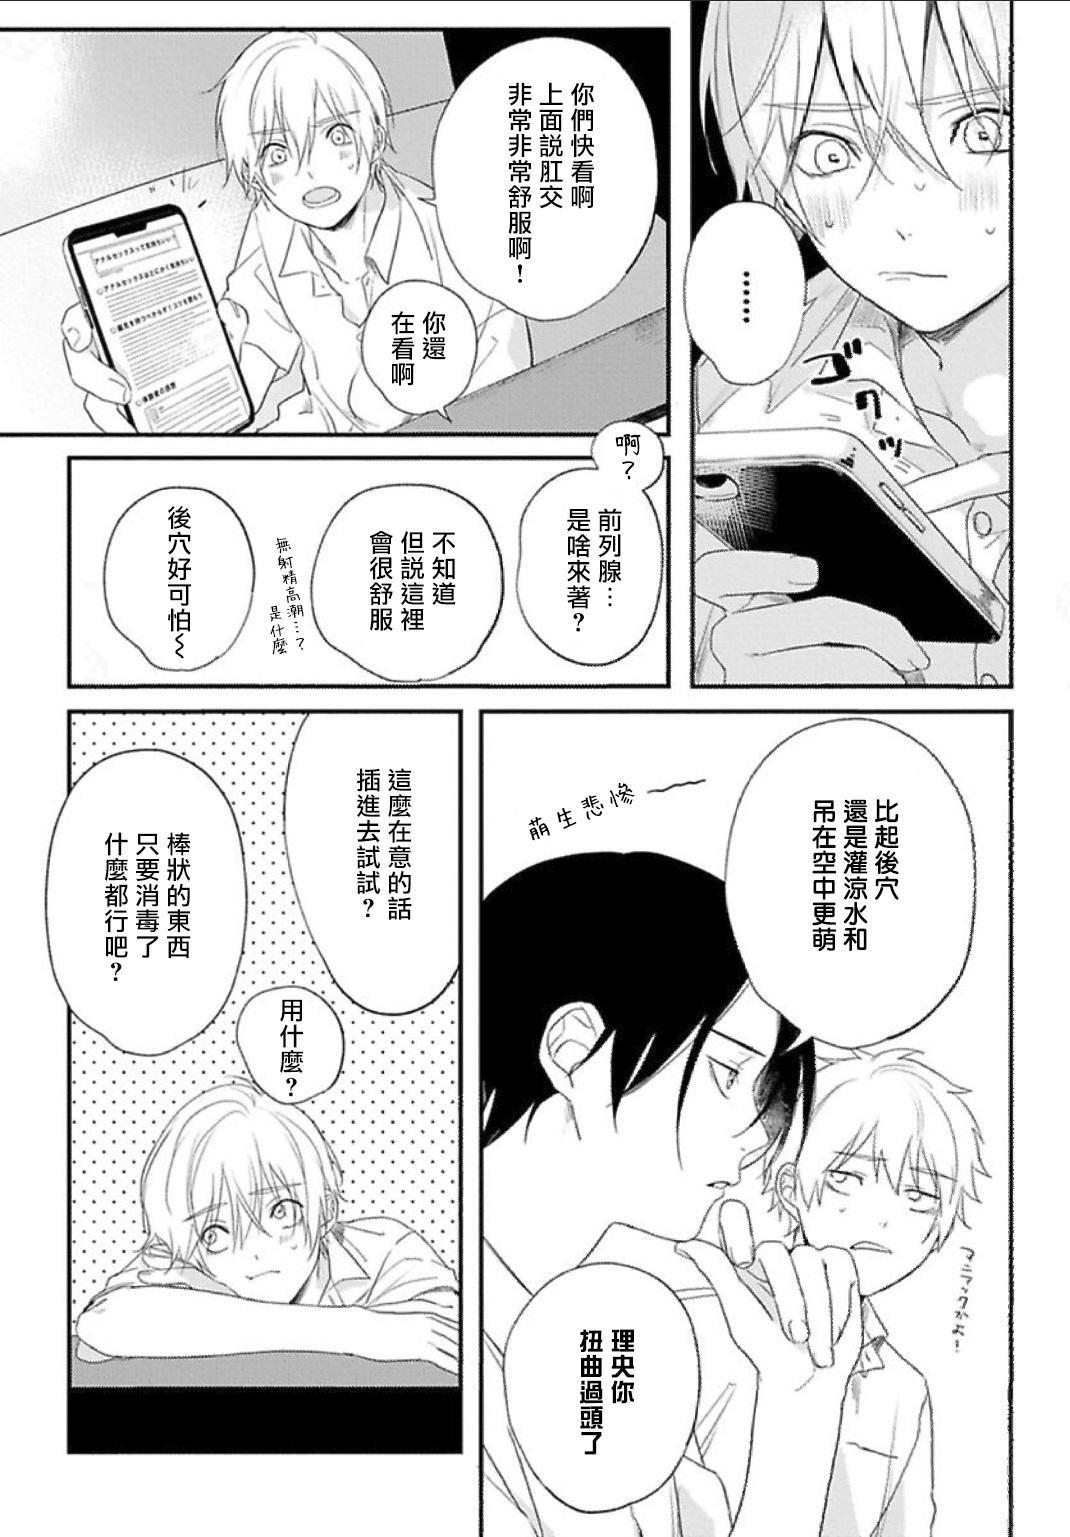 [Utata Hakuto] Houkago Virginity - Virginity afterschool 1-3 [Chinese] [拾荒者汉化组] [Digital] 4